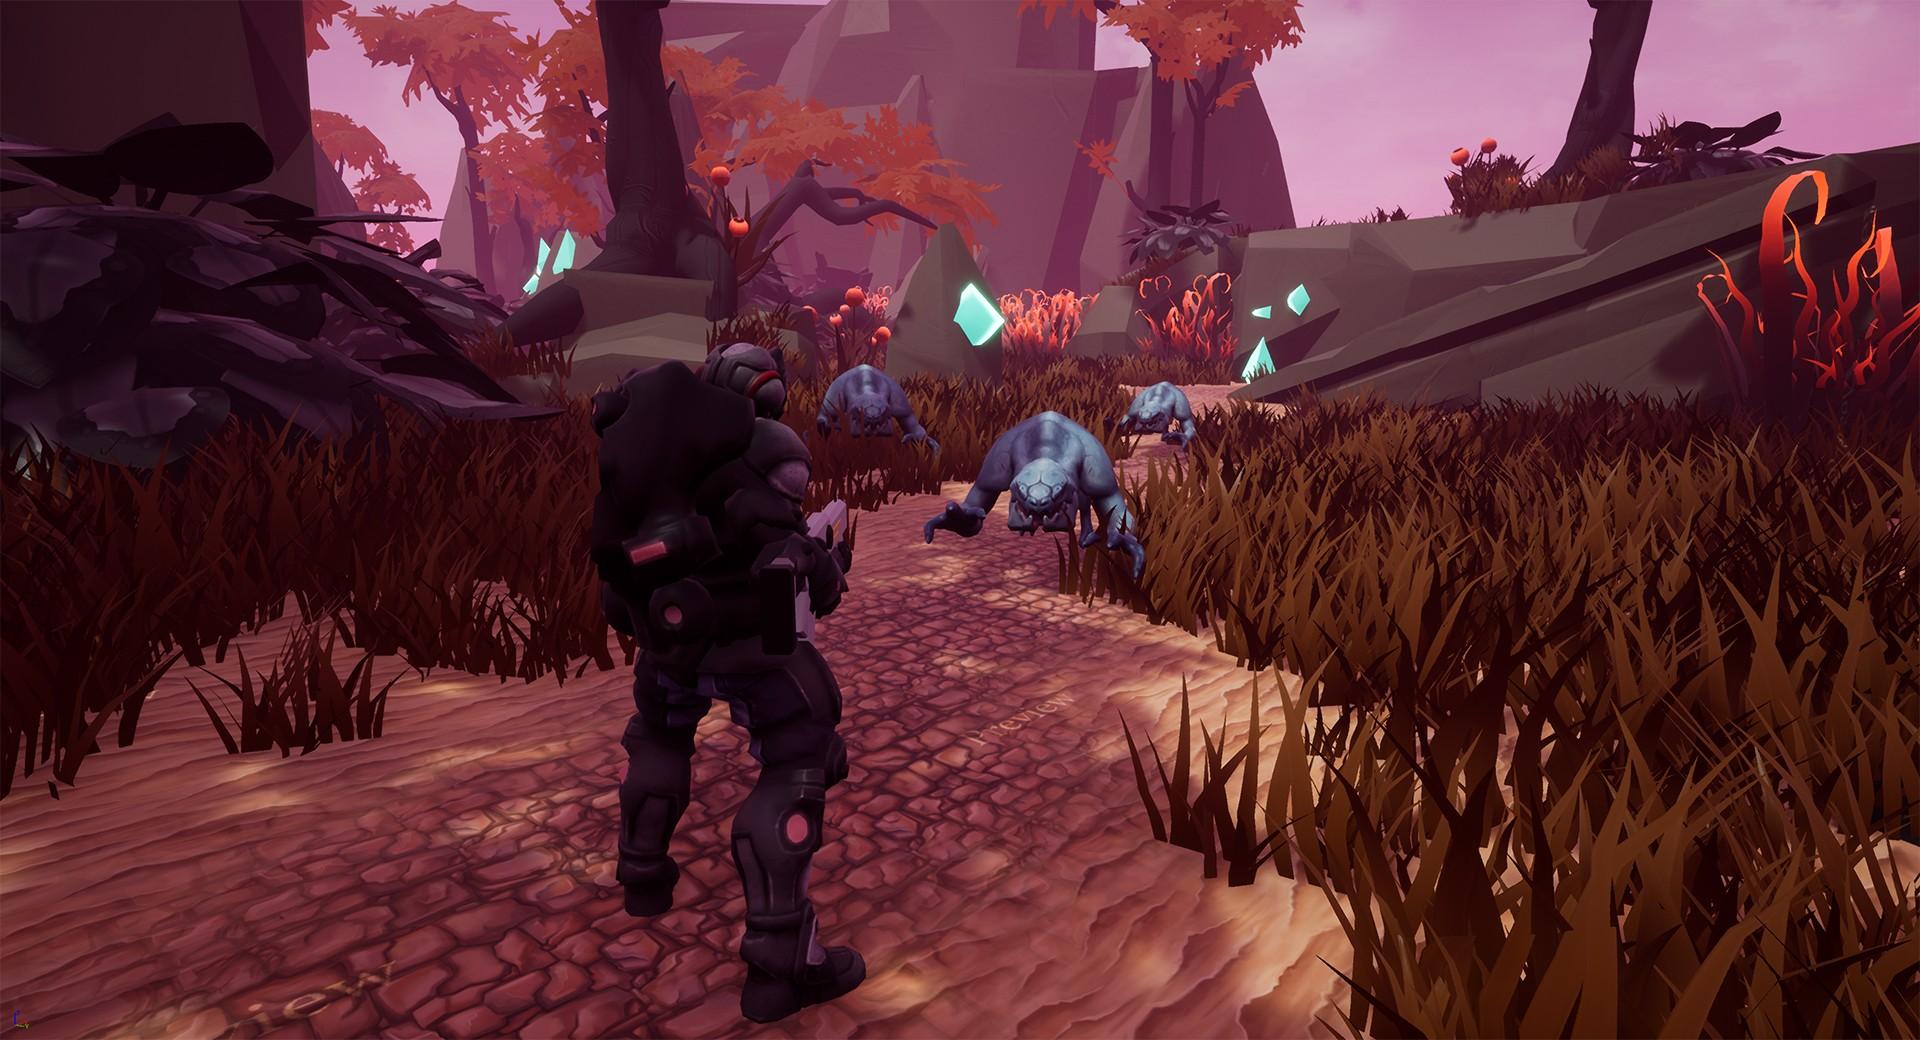 image gameplay1.jpeg